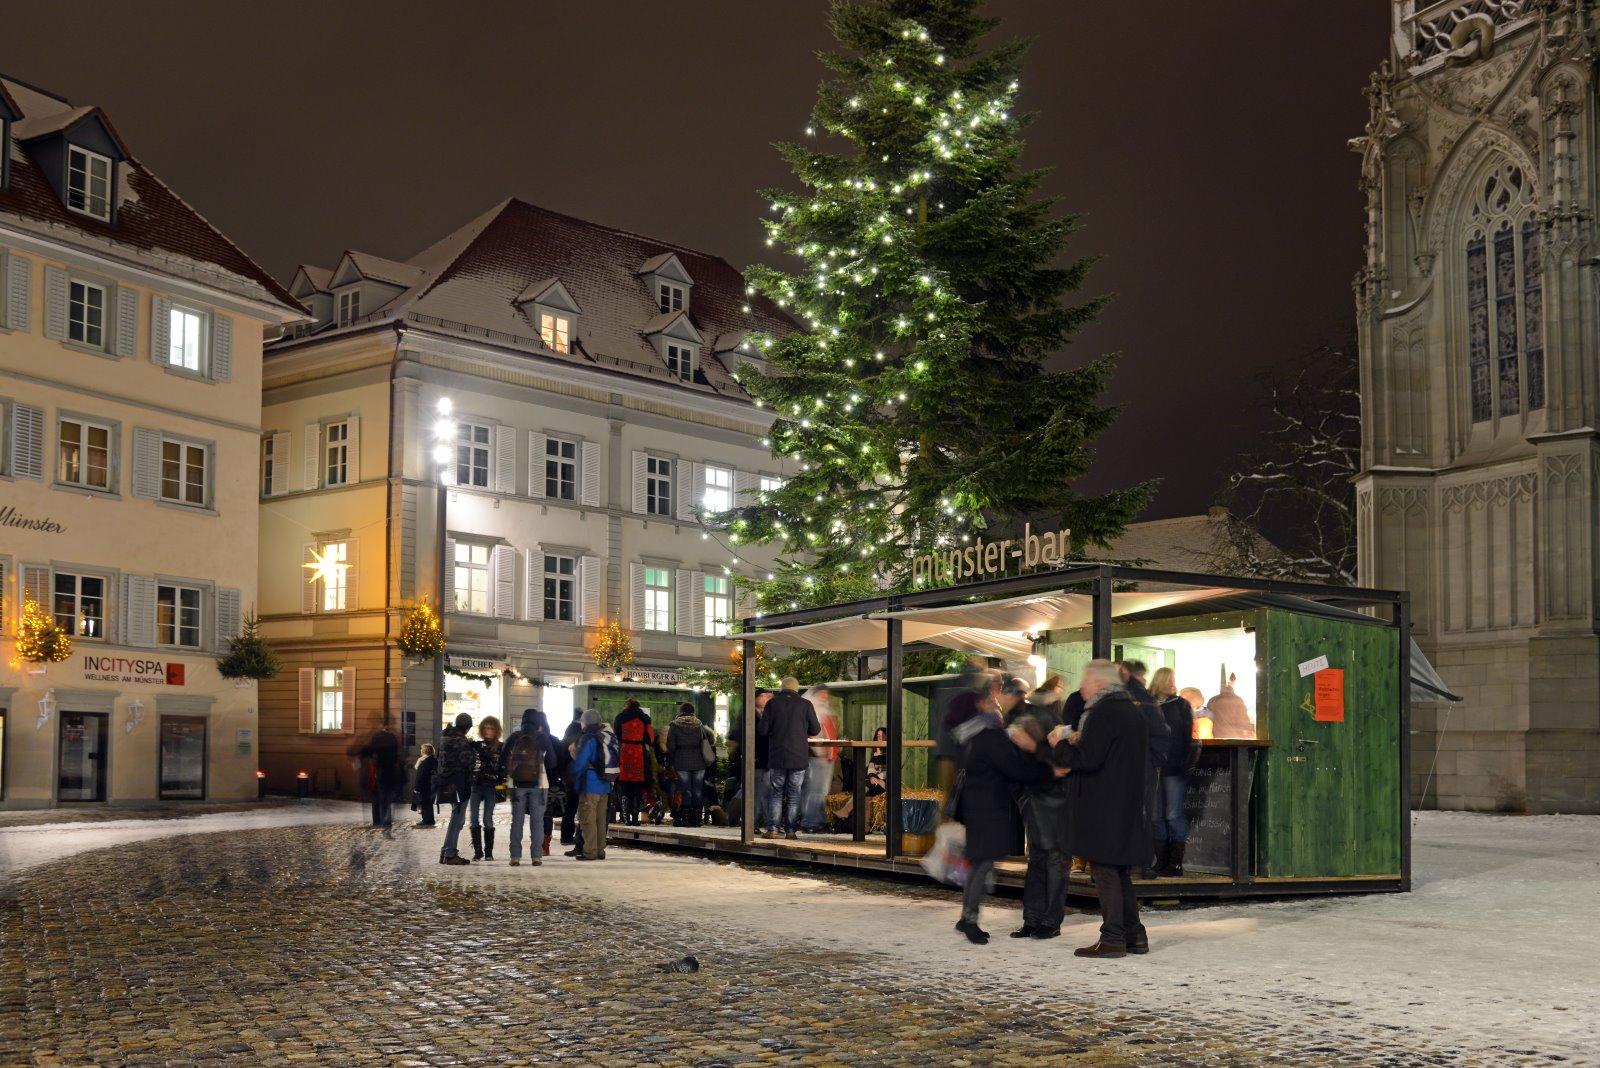 Münsterbar Konstanz